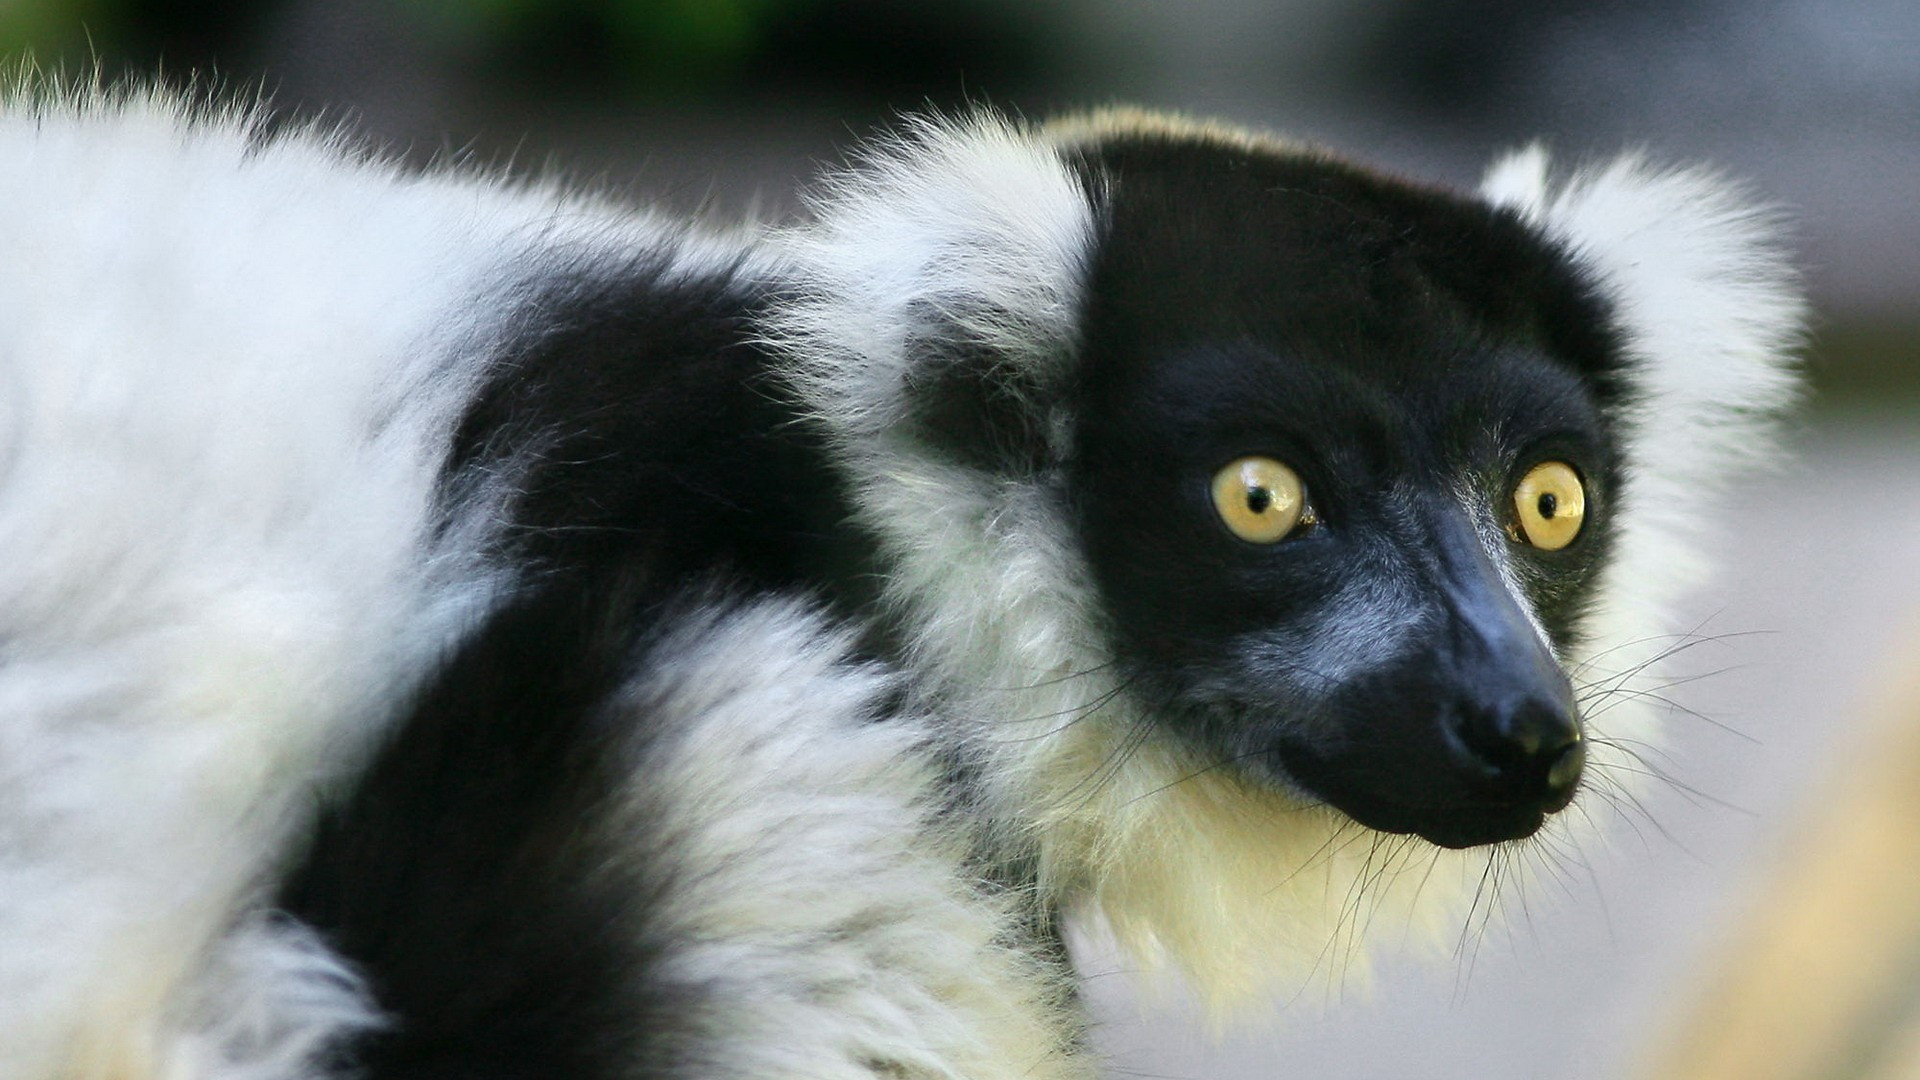 Res: 1920x1080, best, full hd, amazing, free, white apple,wild life, lemur,black,  and,_ Wallpaper HD